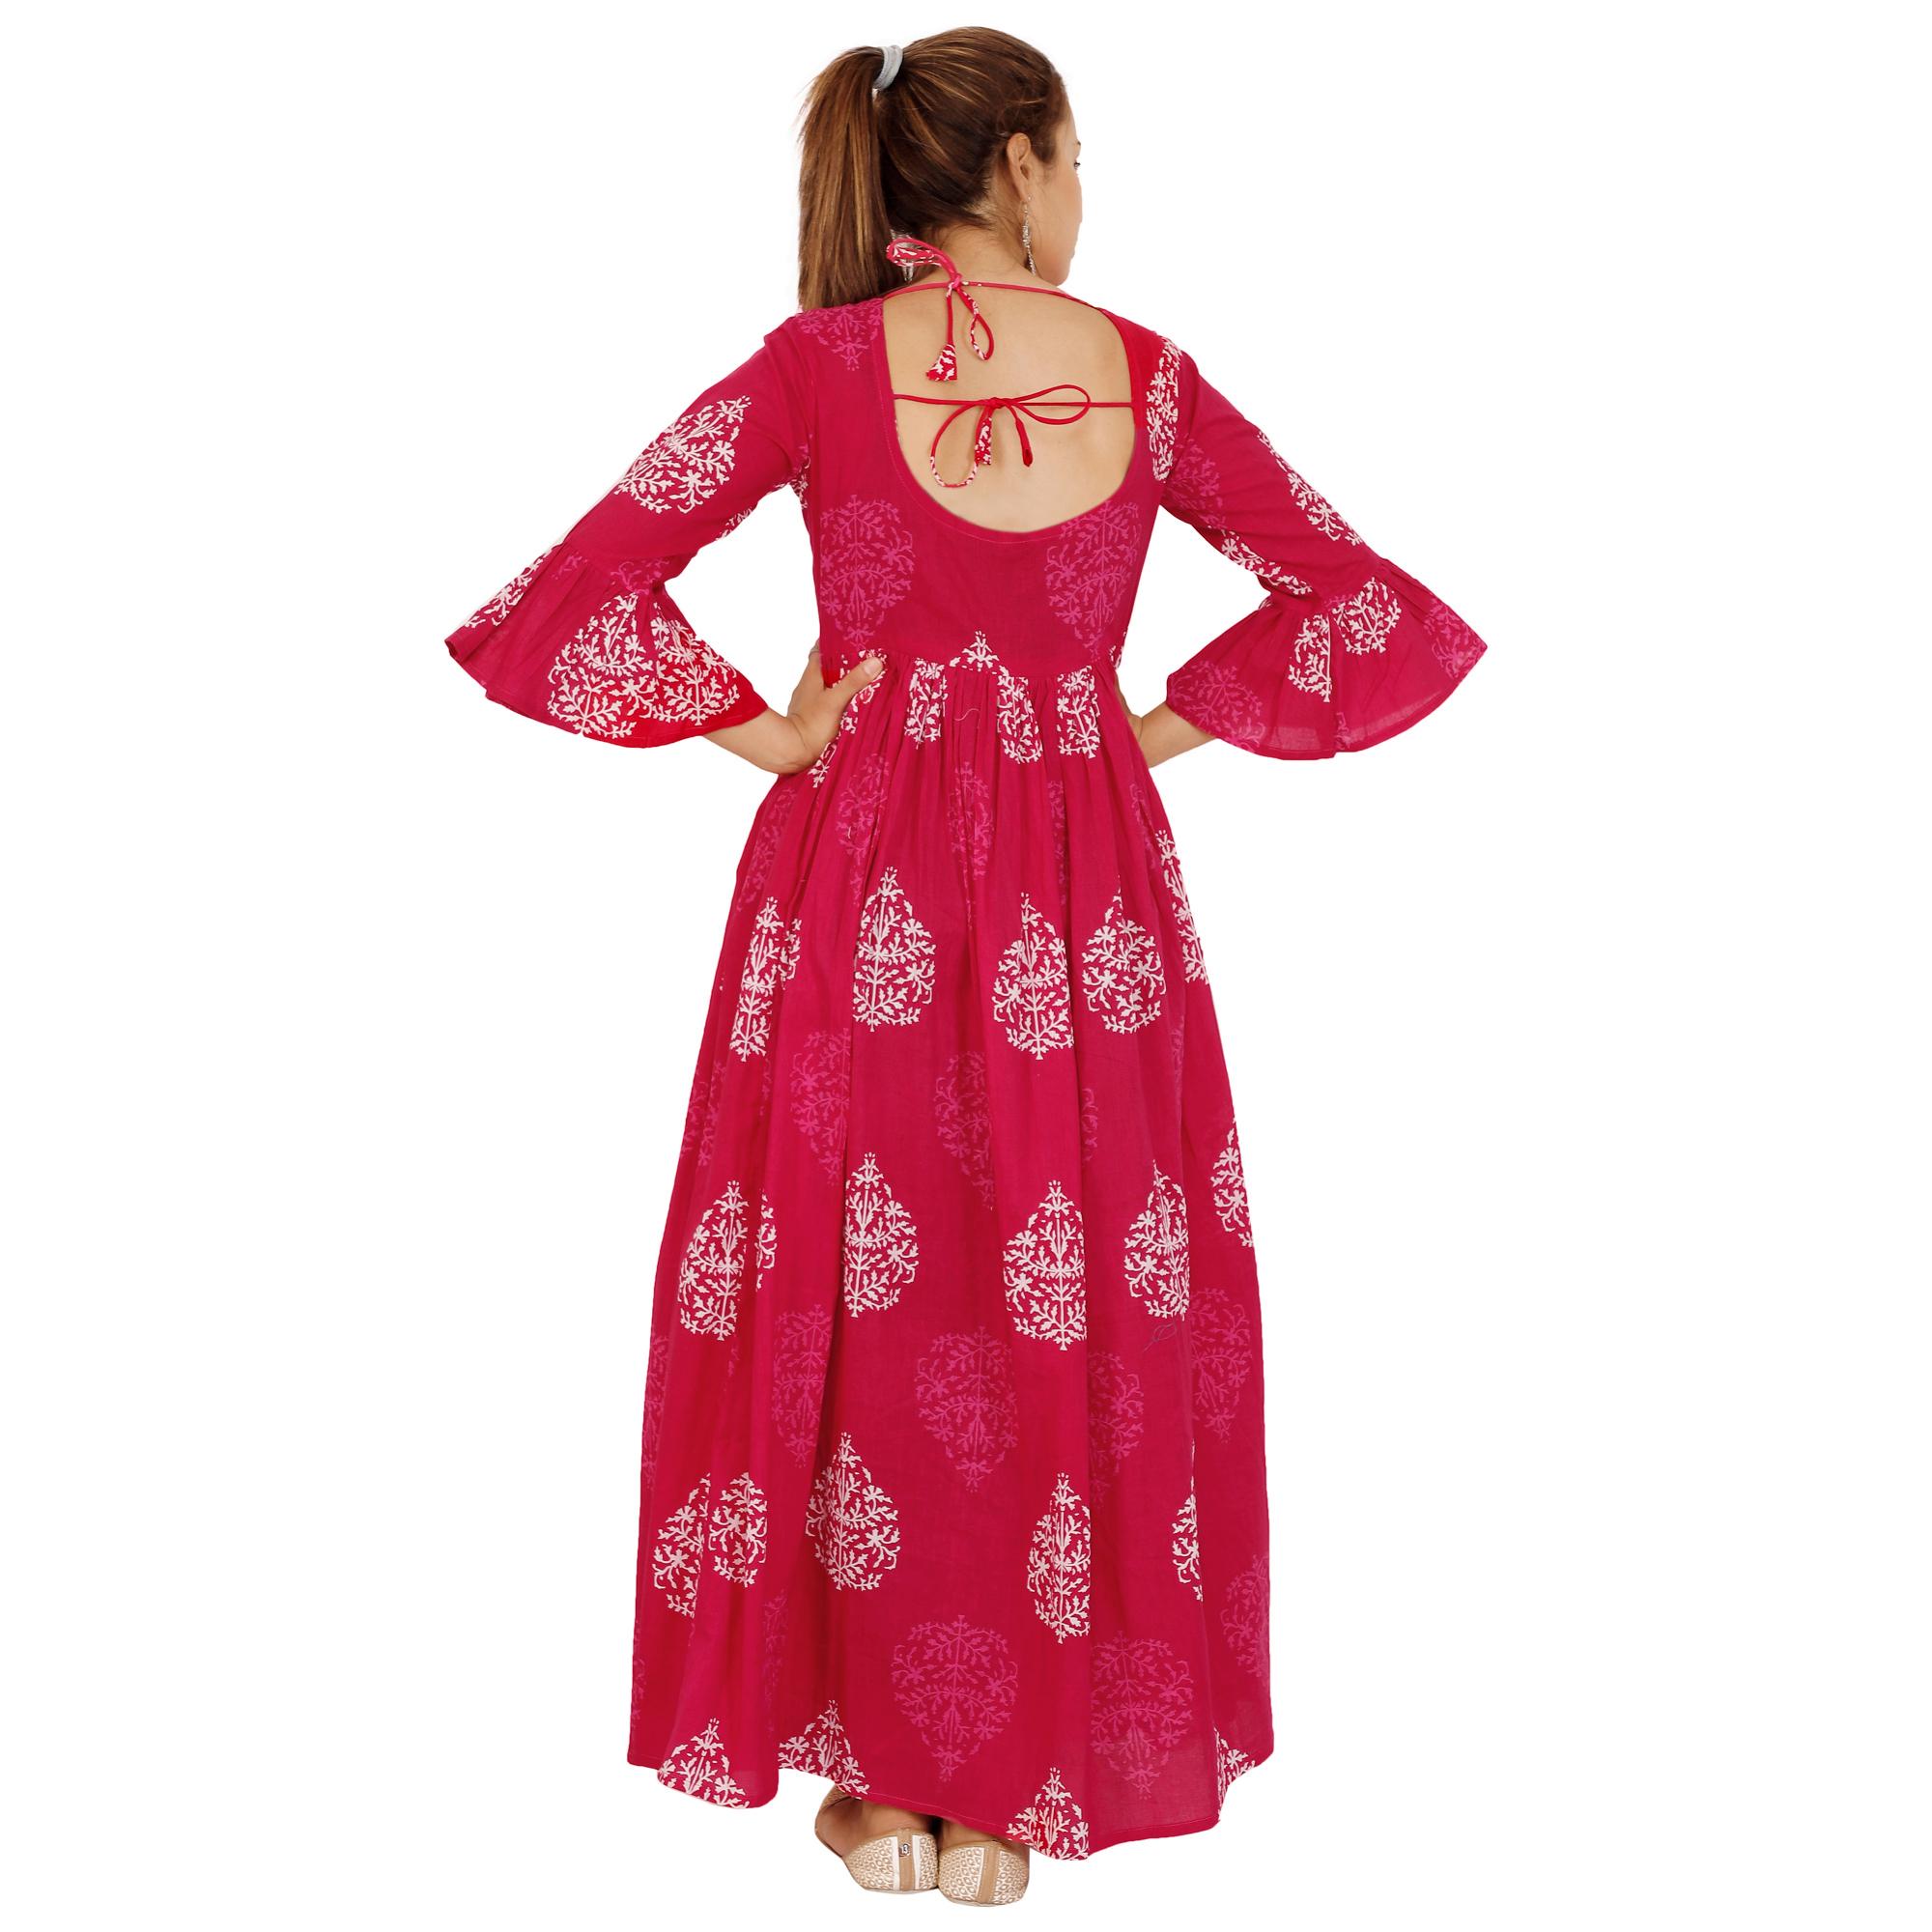 Designer Flower Print Backless Dress